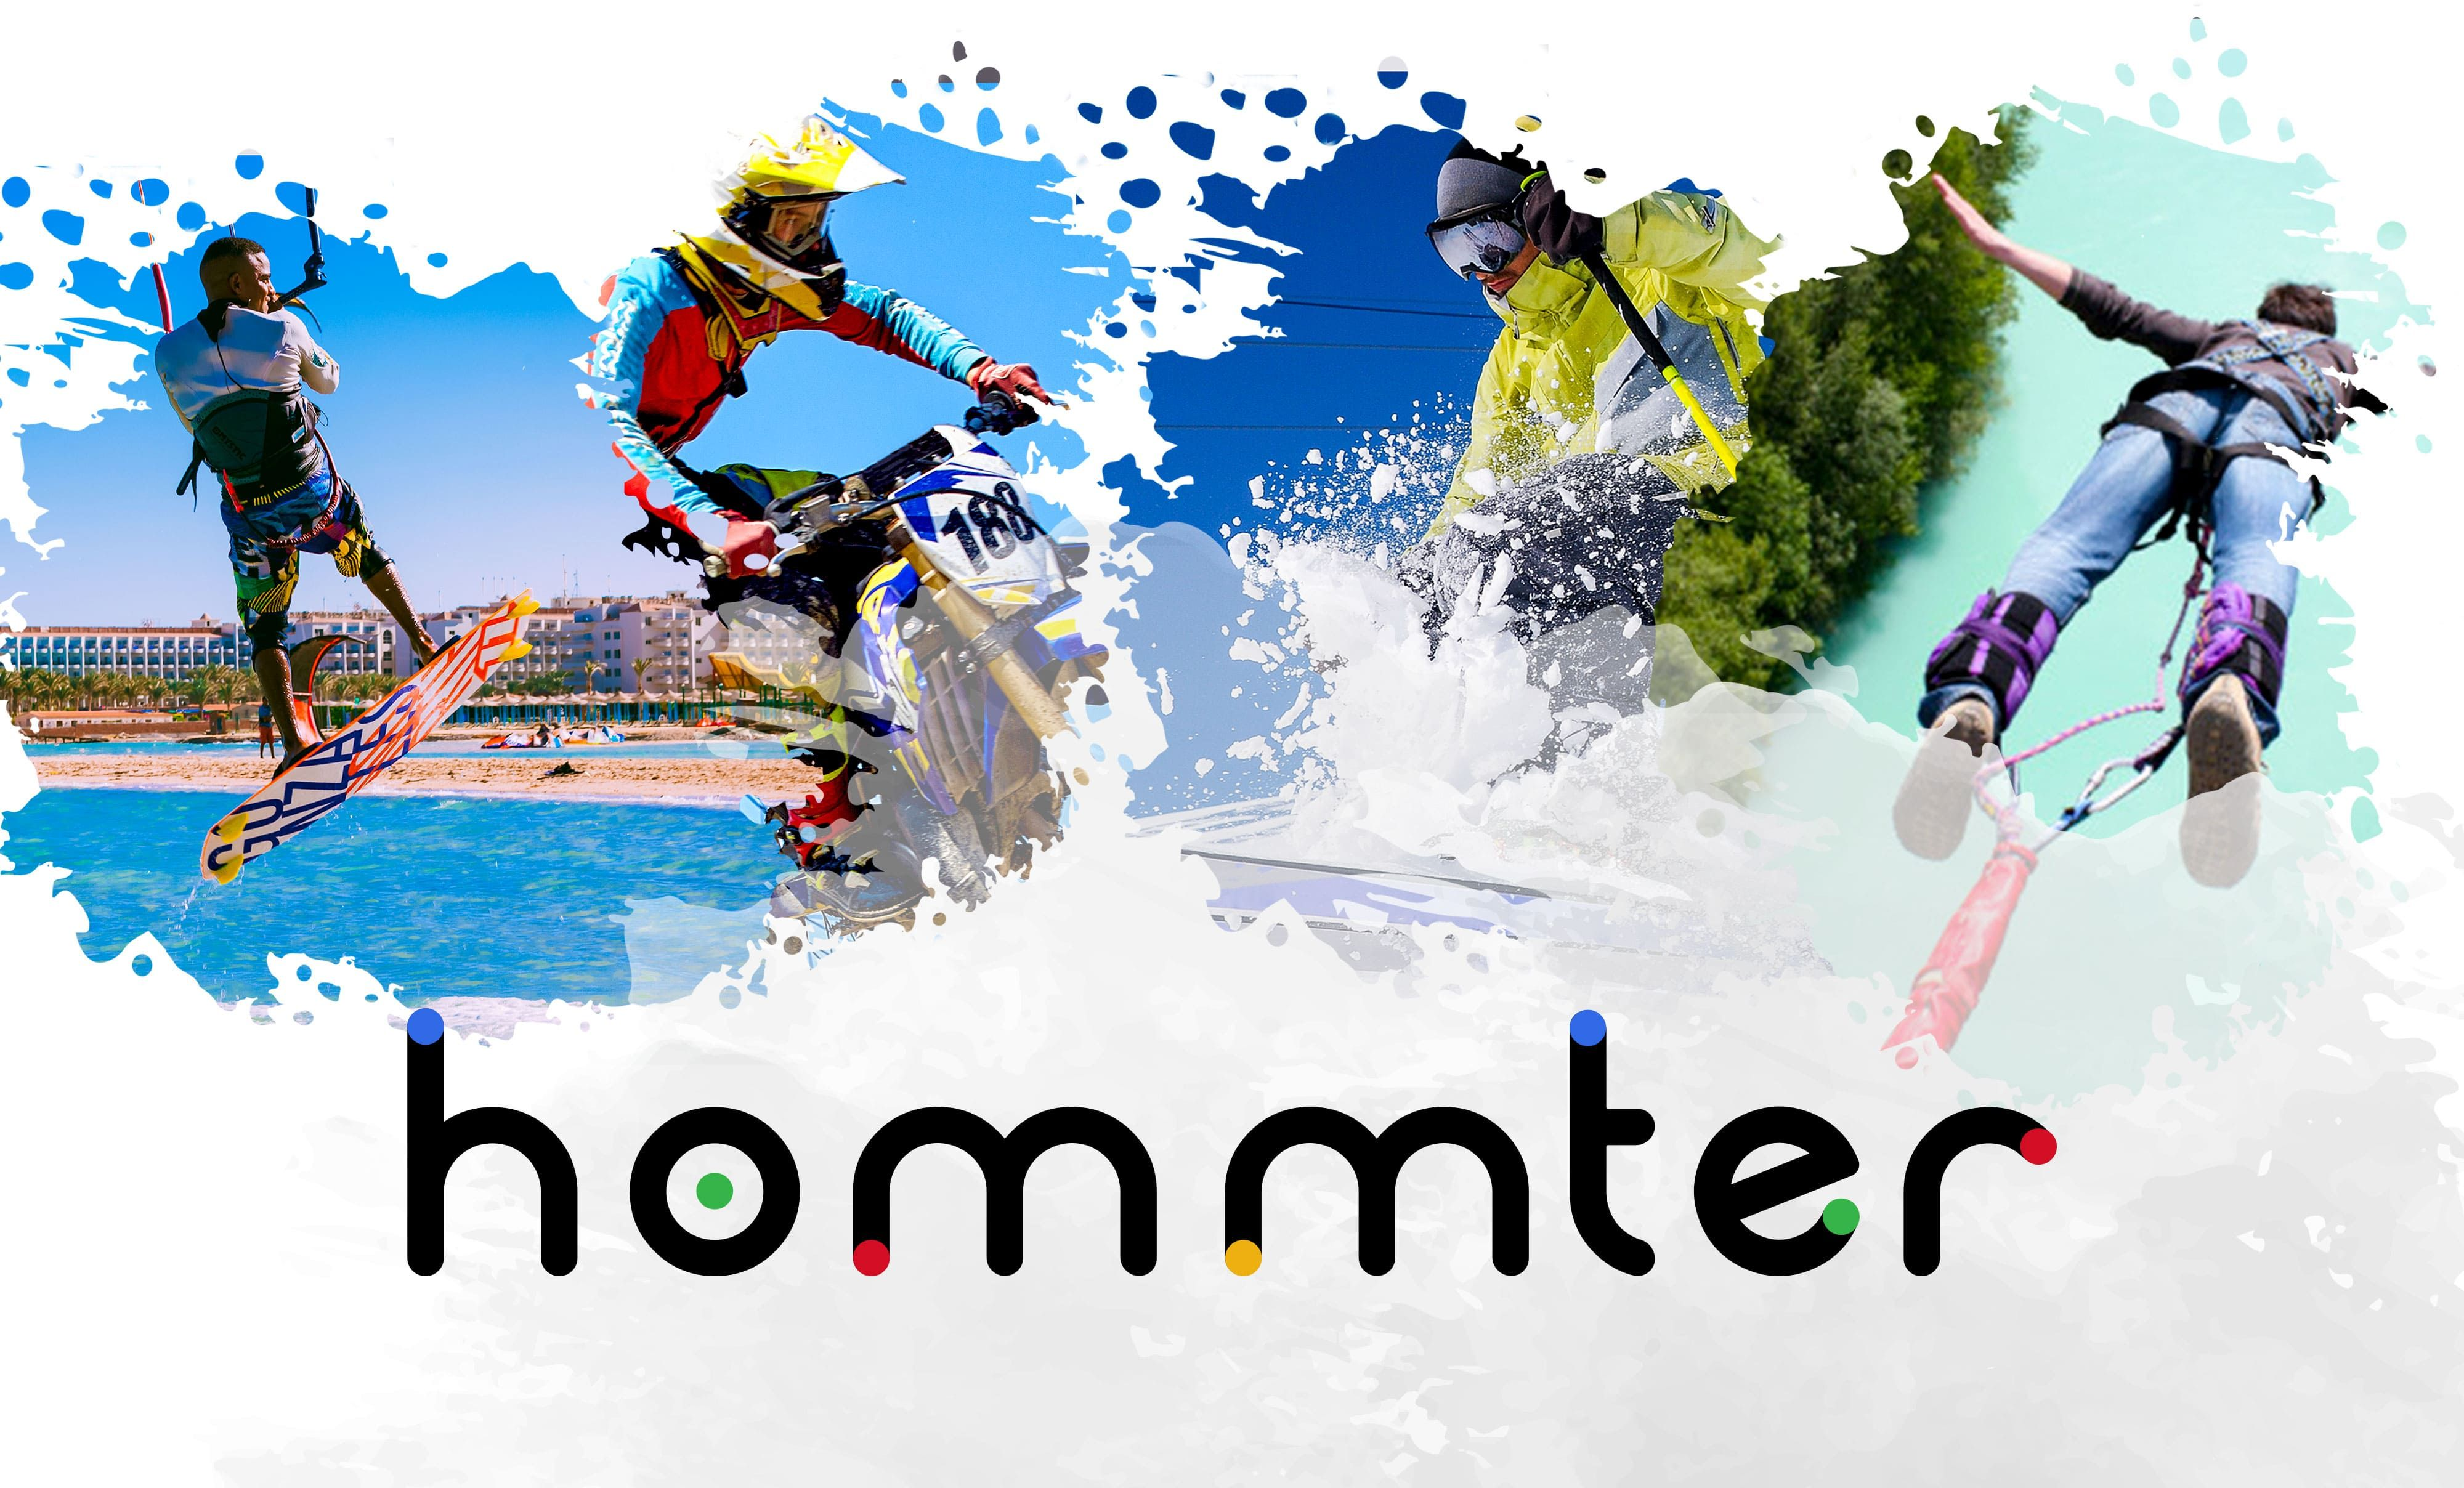 Fotografia Hommter, el marketplace de deportes de aventura, comienza